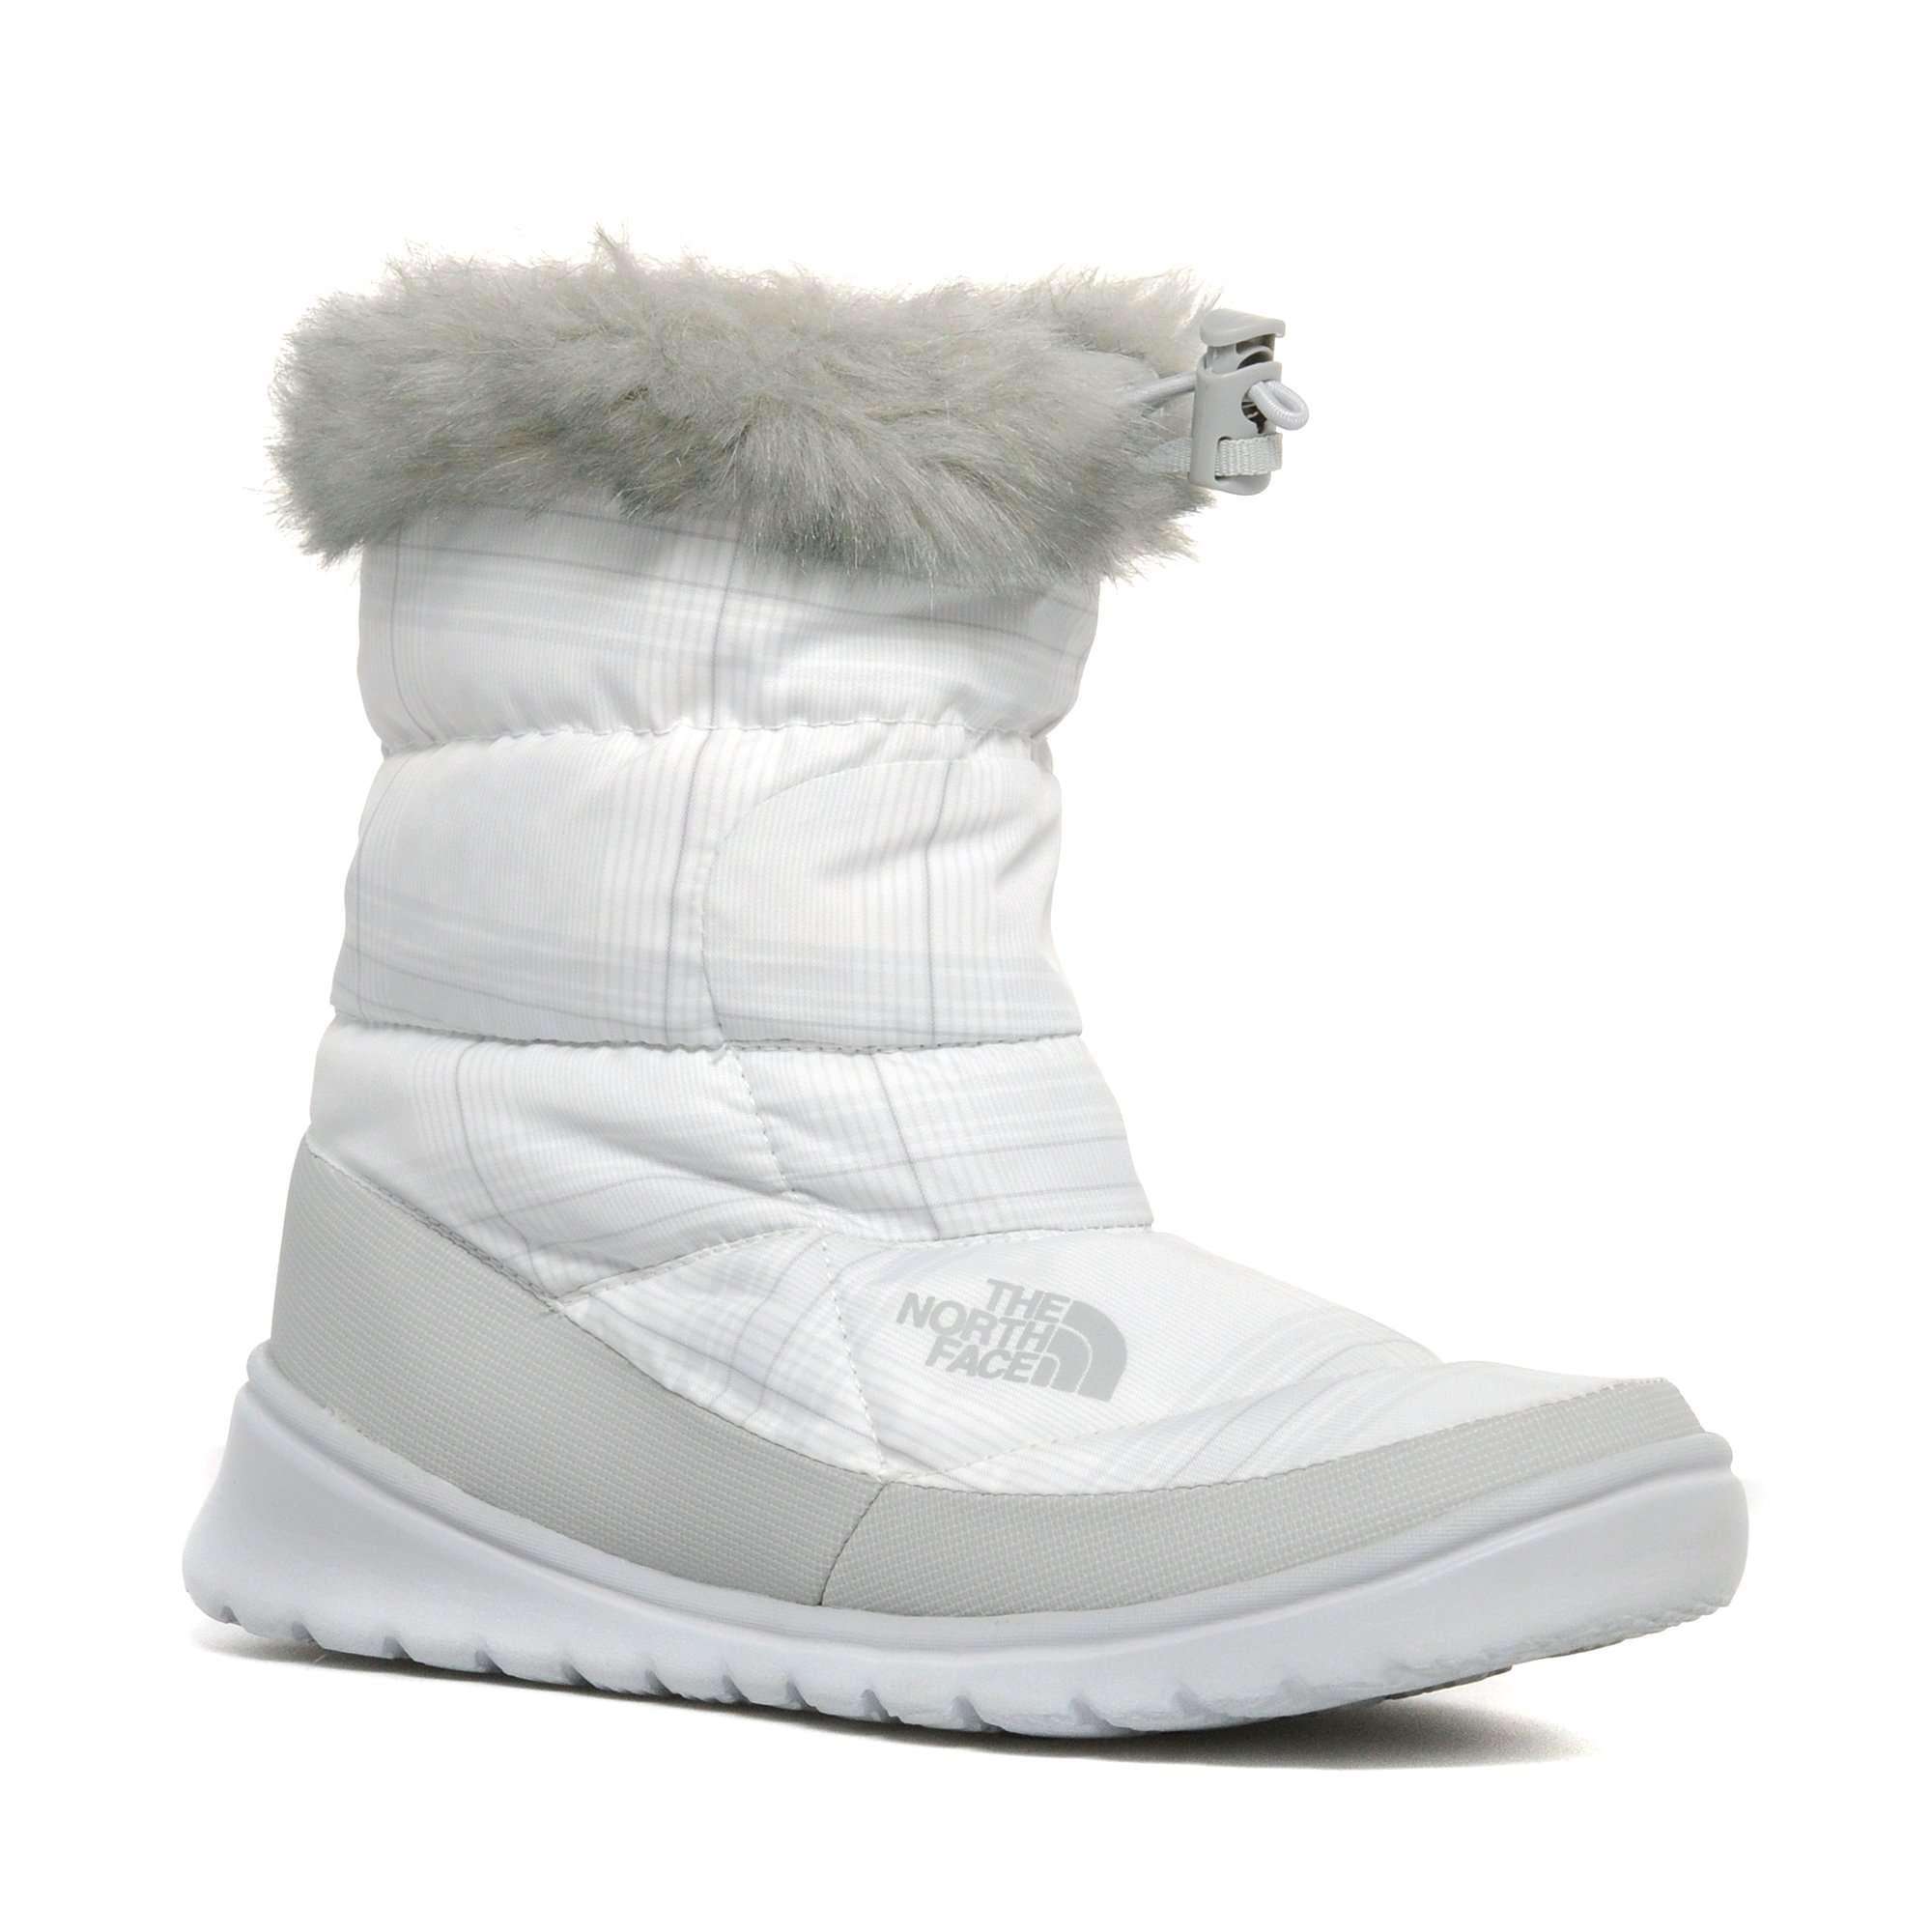 THE NORTH FACE Women's Nuptse Fur IV Snow Boot